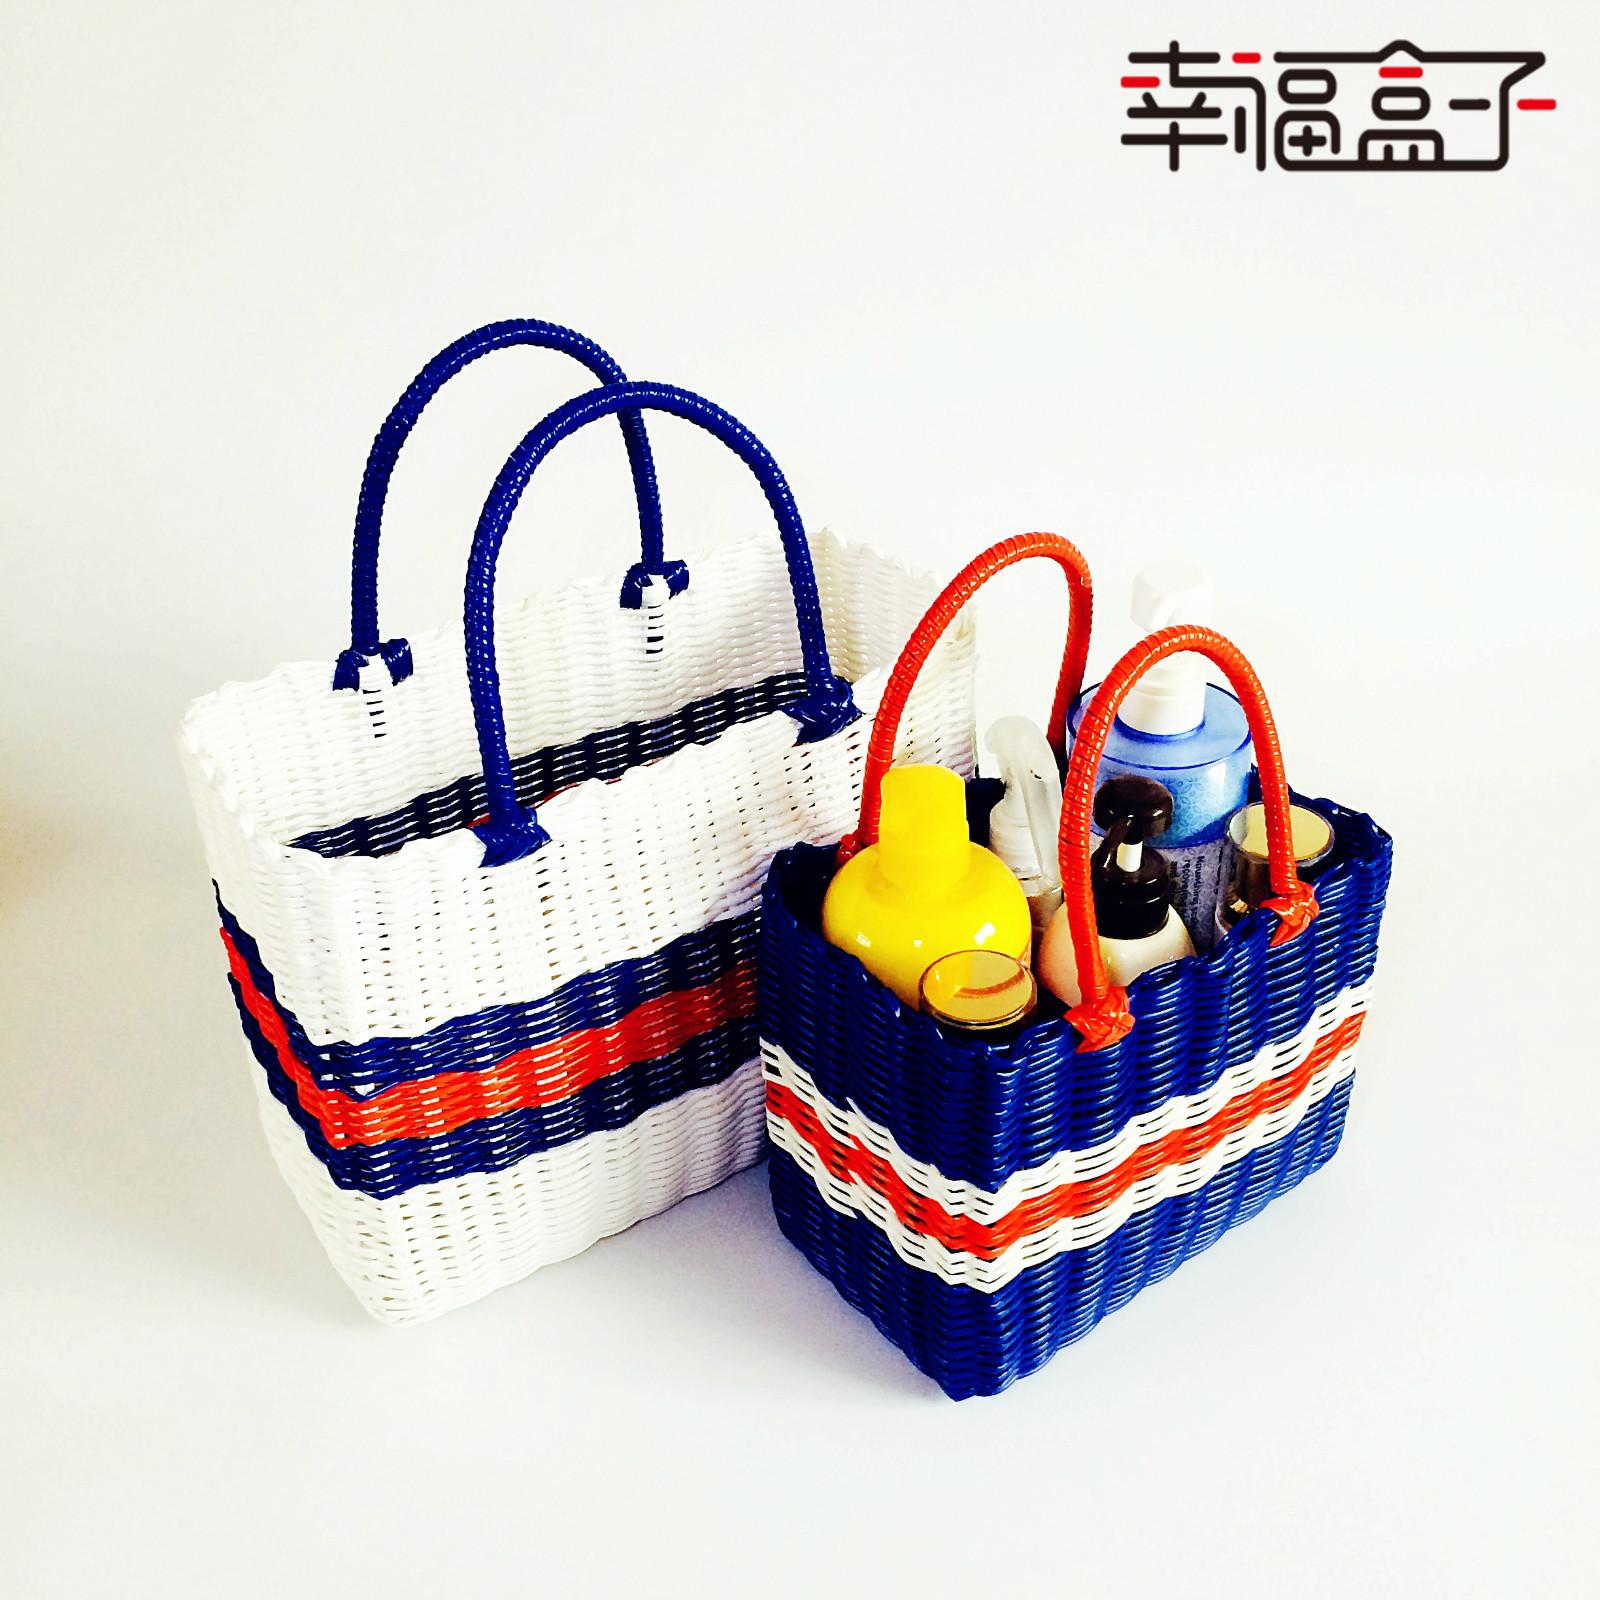 Buy food basket plastic woven basket shopping basket pick basket picnic basket hand bath basket bath basket bathroom